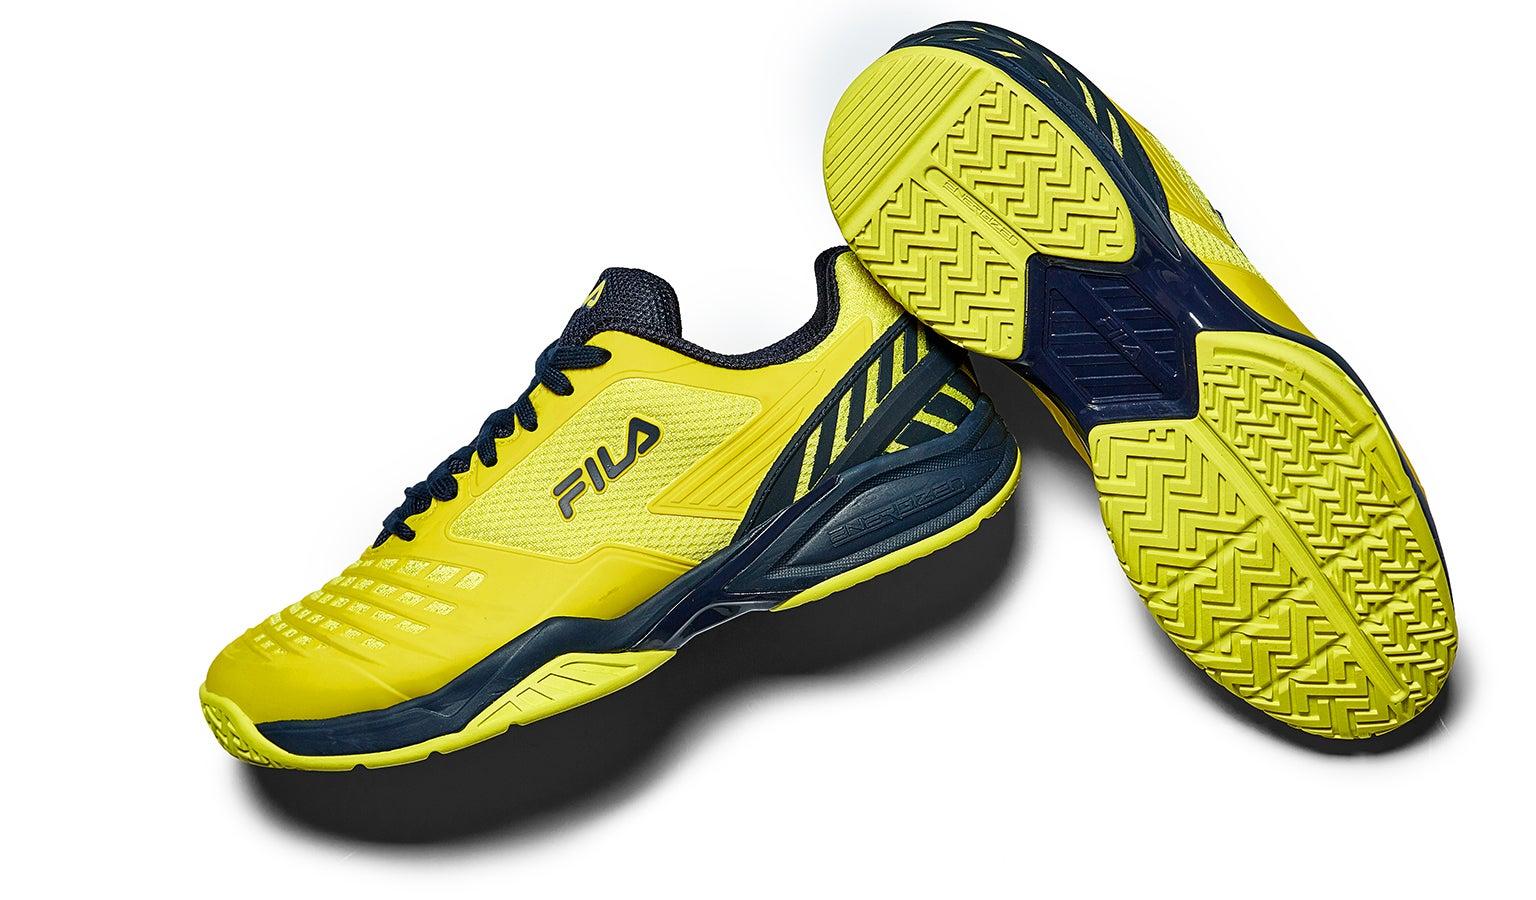 531fd56a58 Tennis Warehouse - Fila Axilus Energized Men s Shoe Review